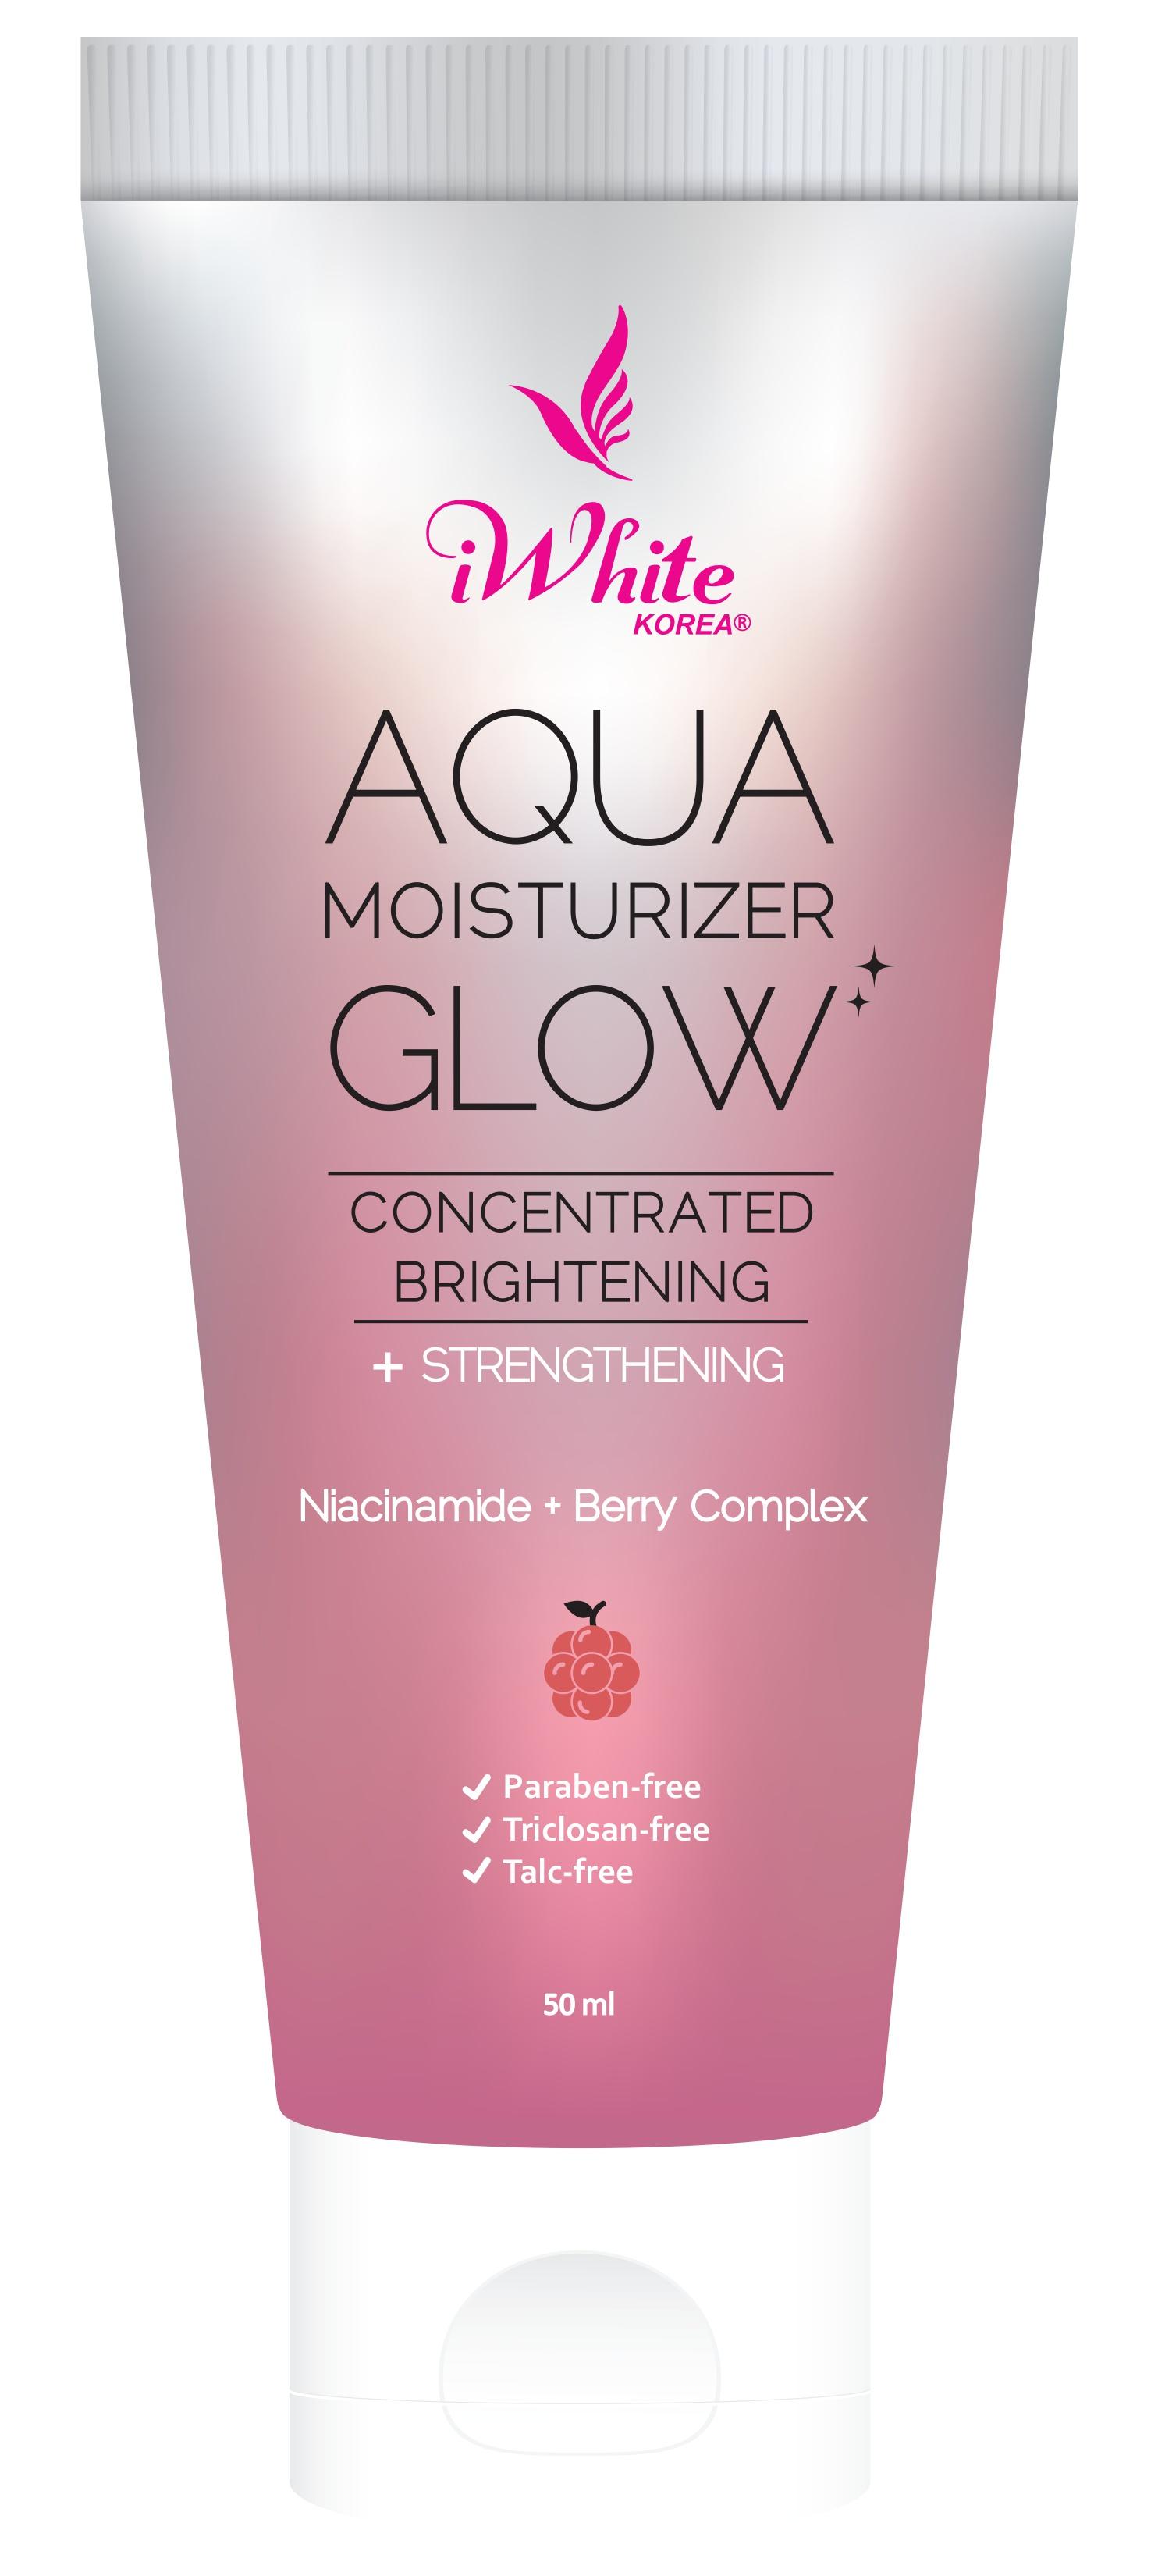 iWhite Korea Aqua Moisturizer Glow Concentrated Brightening